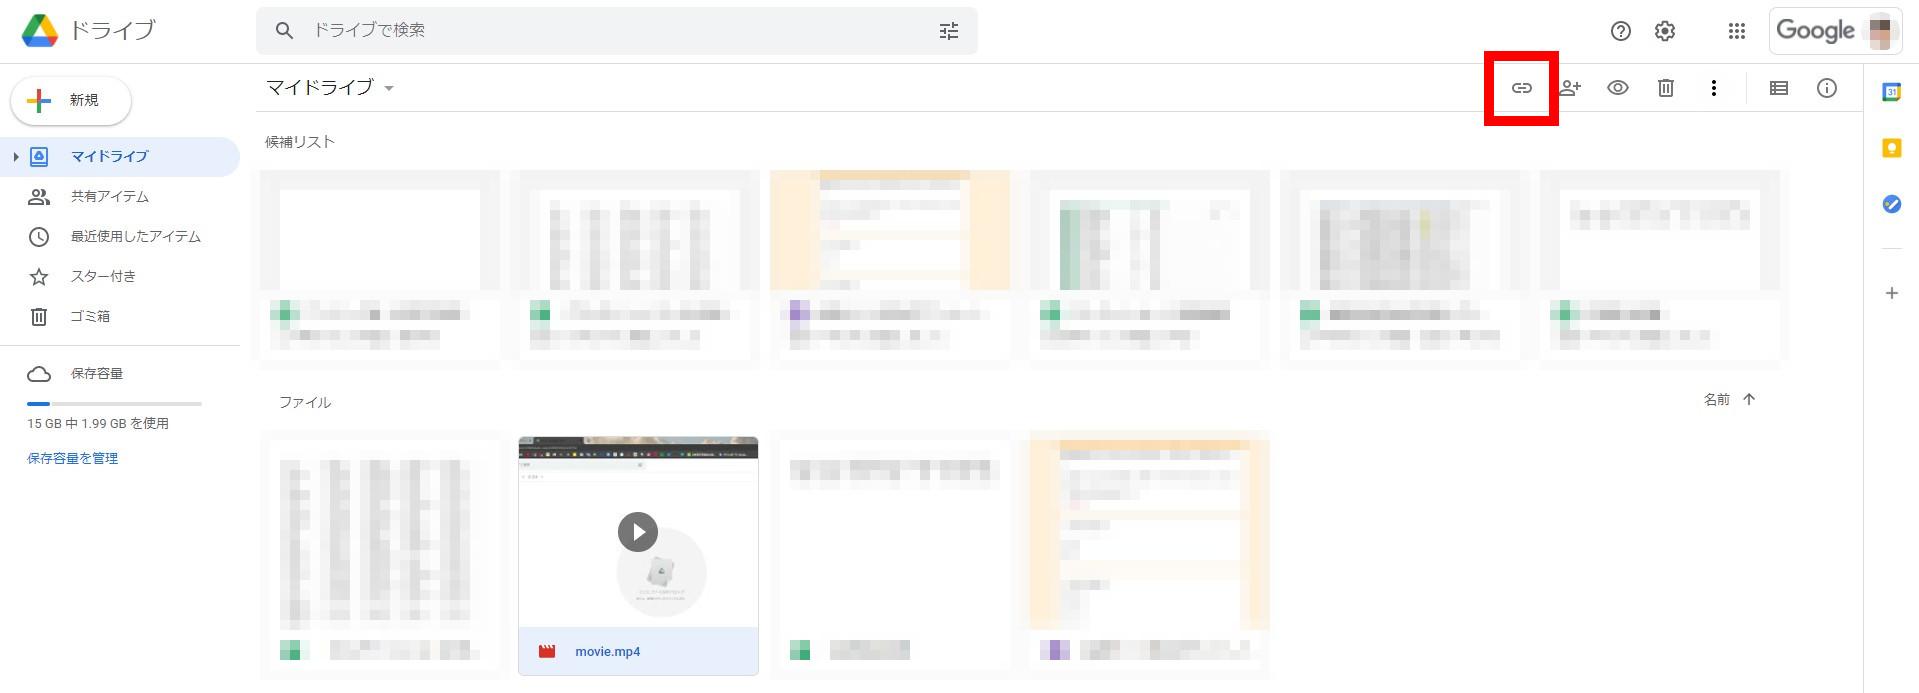 Googleドライブの画面右上の鎖マークをクリック